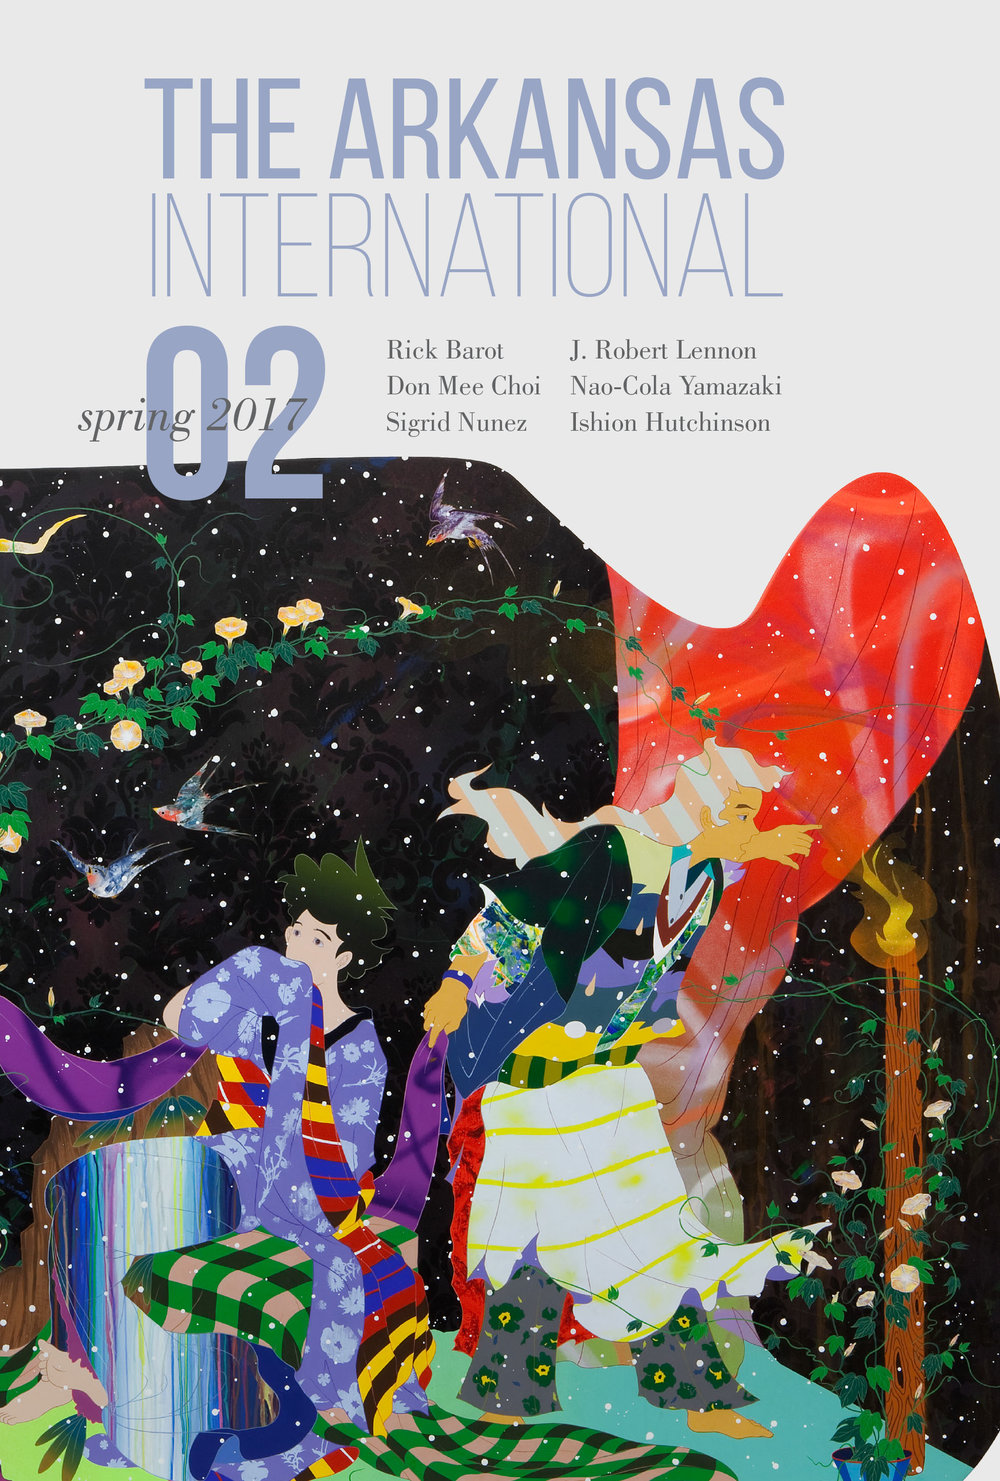 Cover art by Tomokazu Matsuyama